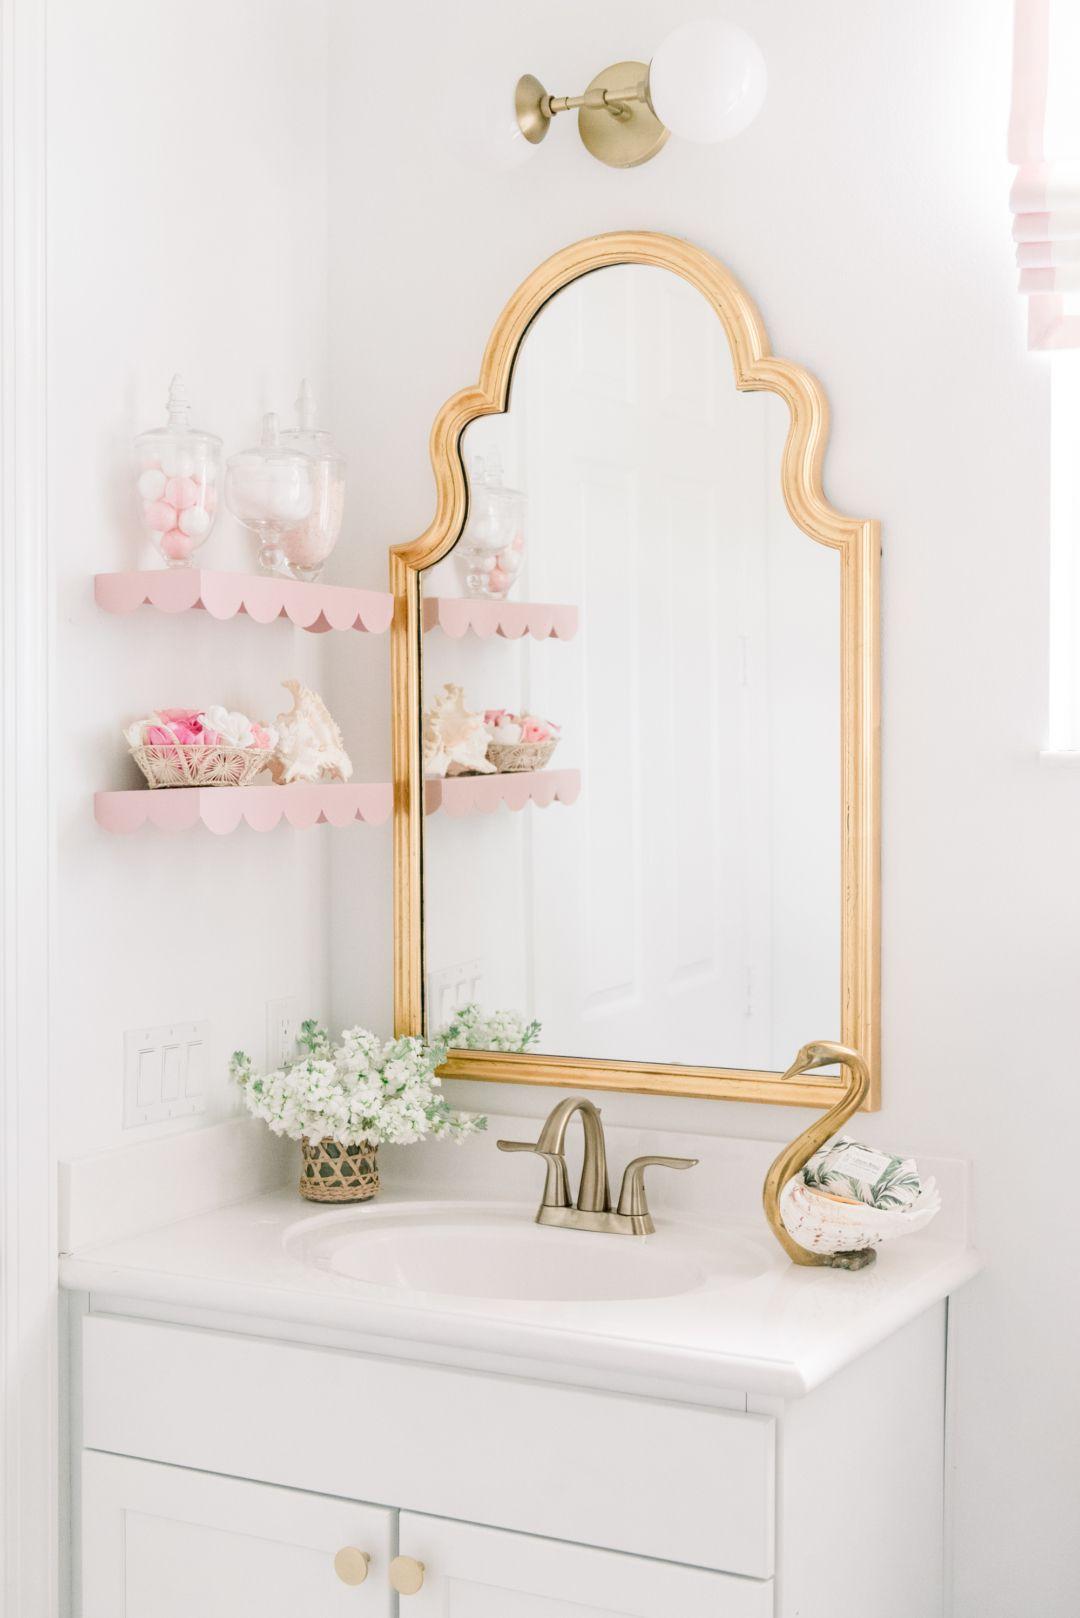 Home Blush And Brass Bathroom Gold Bathroom Decor Girls